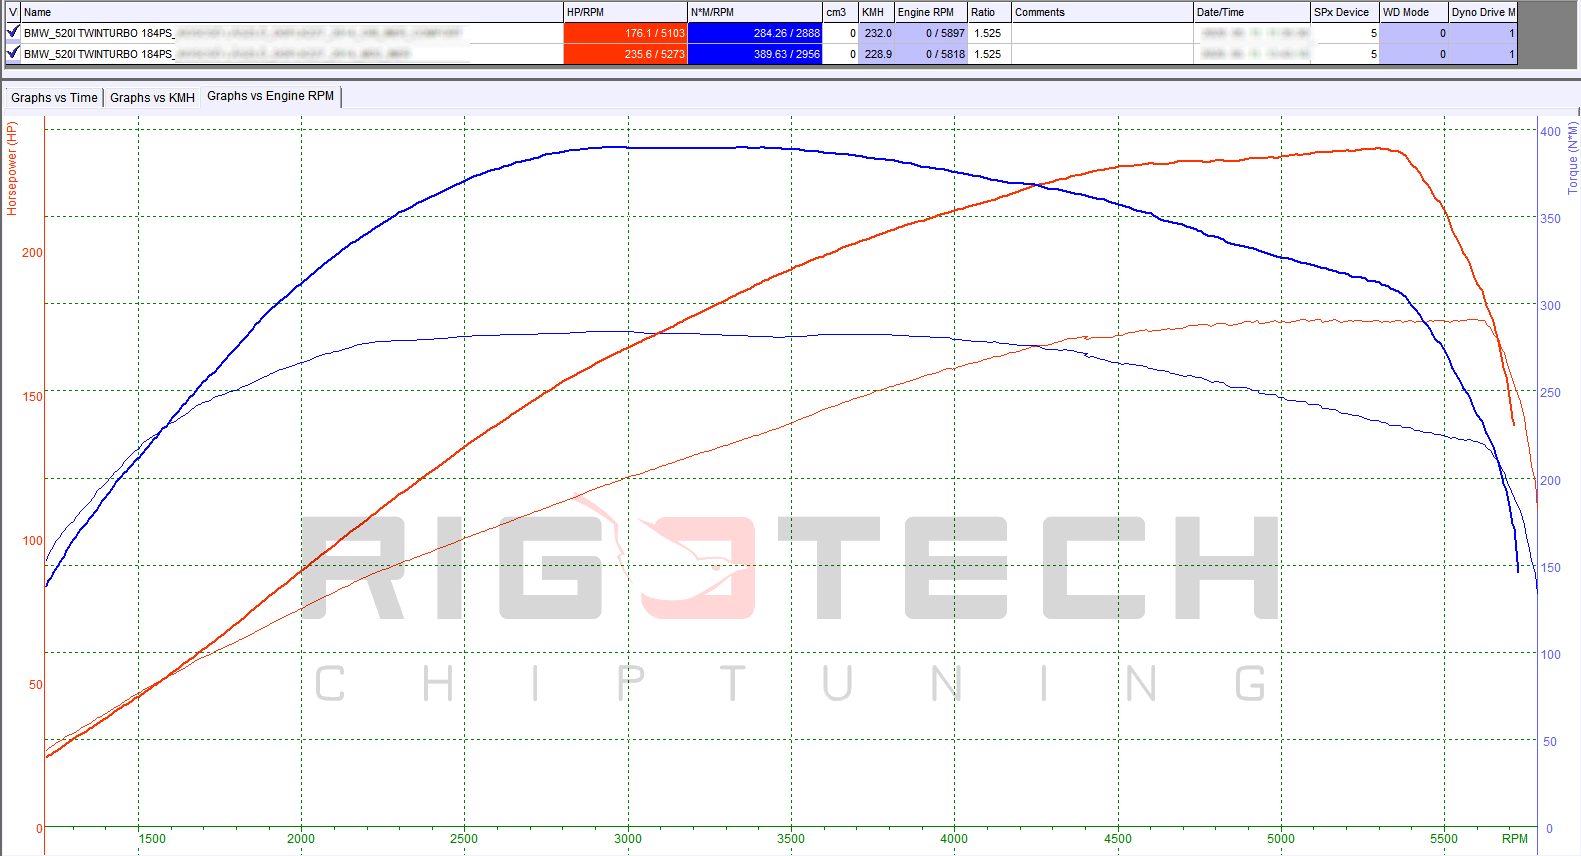 bmw-x4-xdrive20i-184-chiptuning-dyno